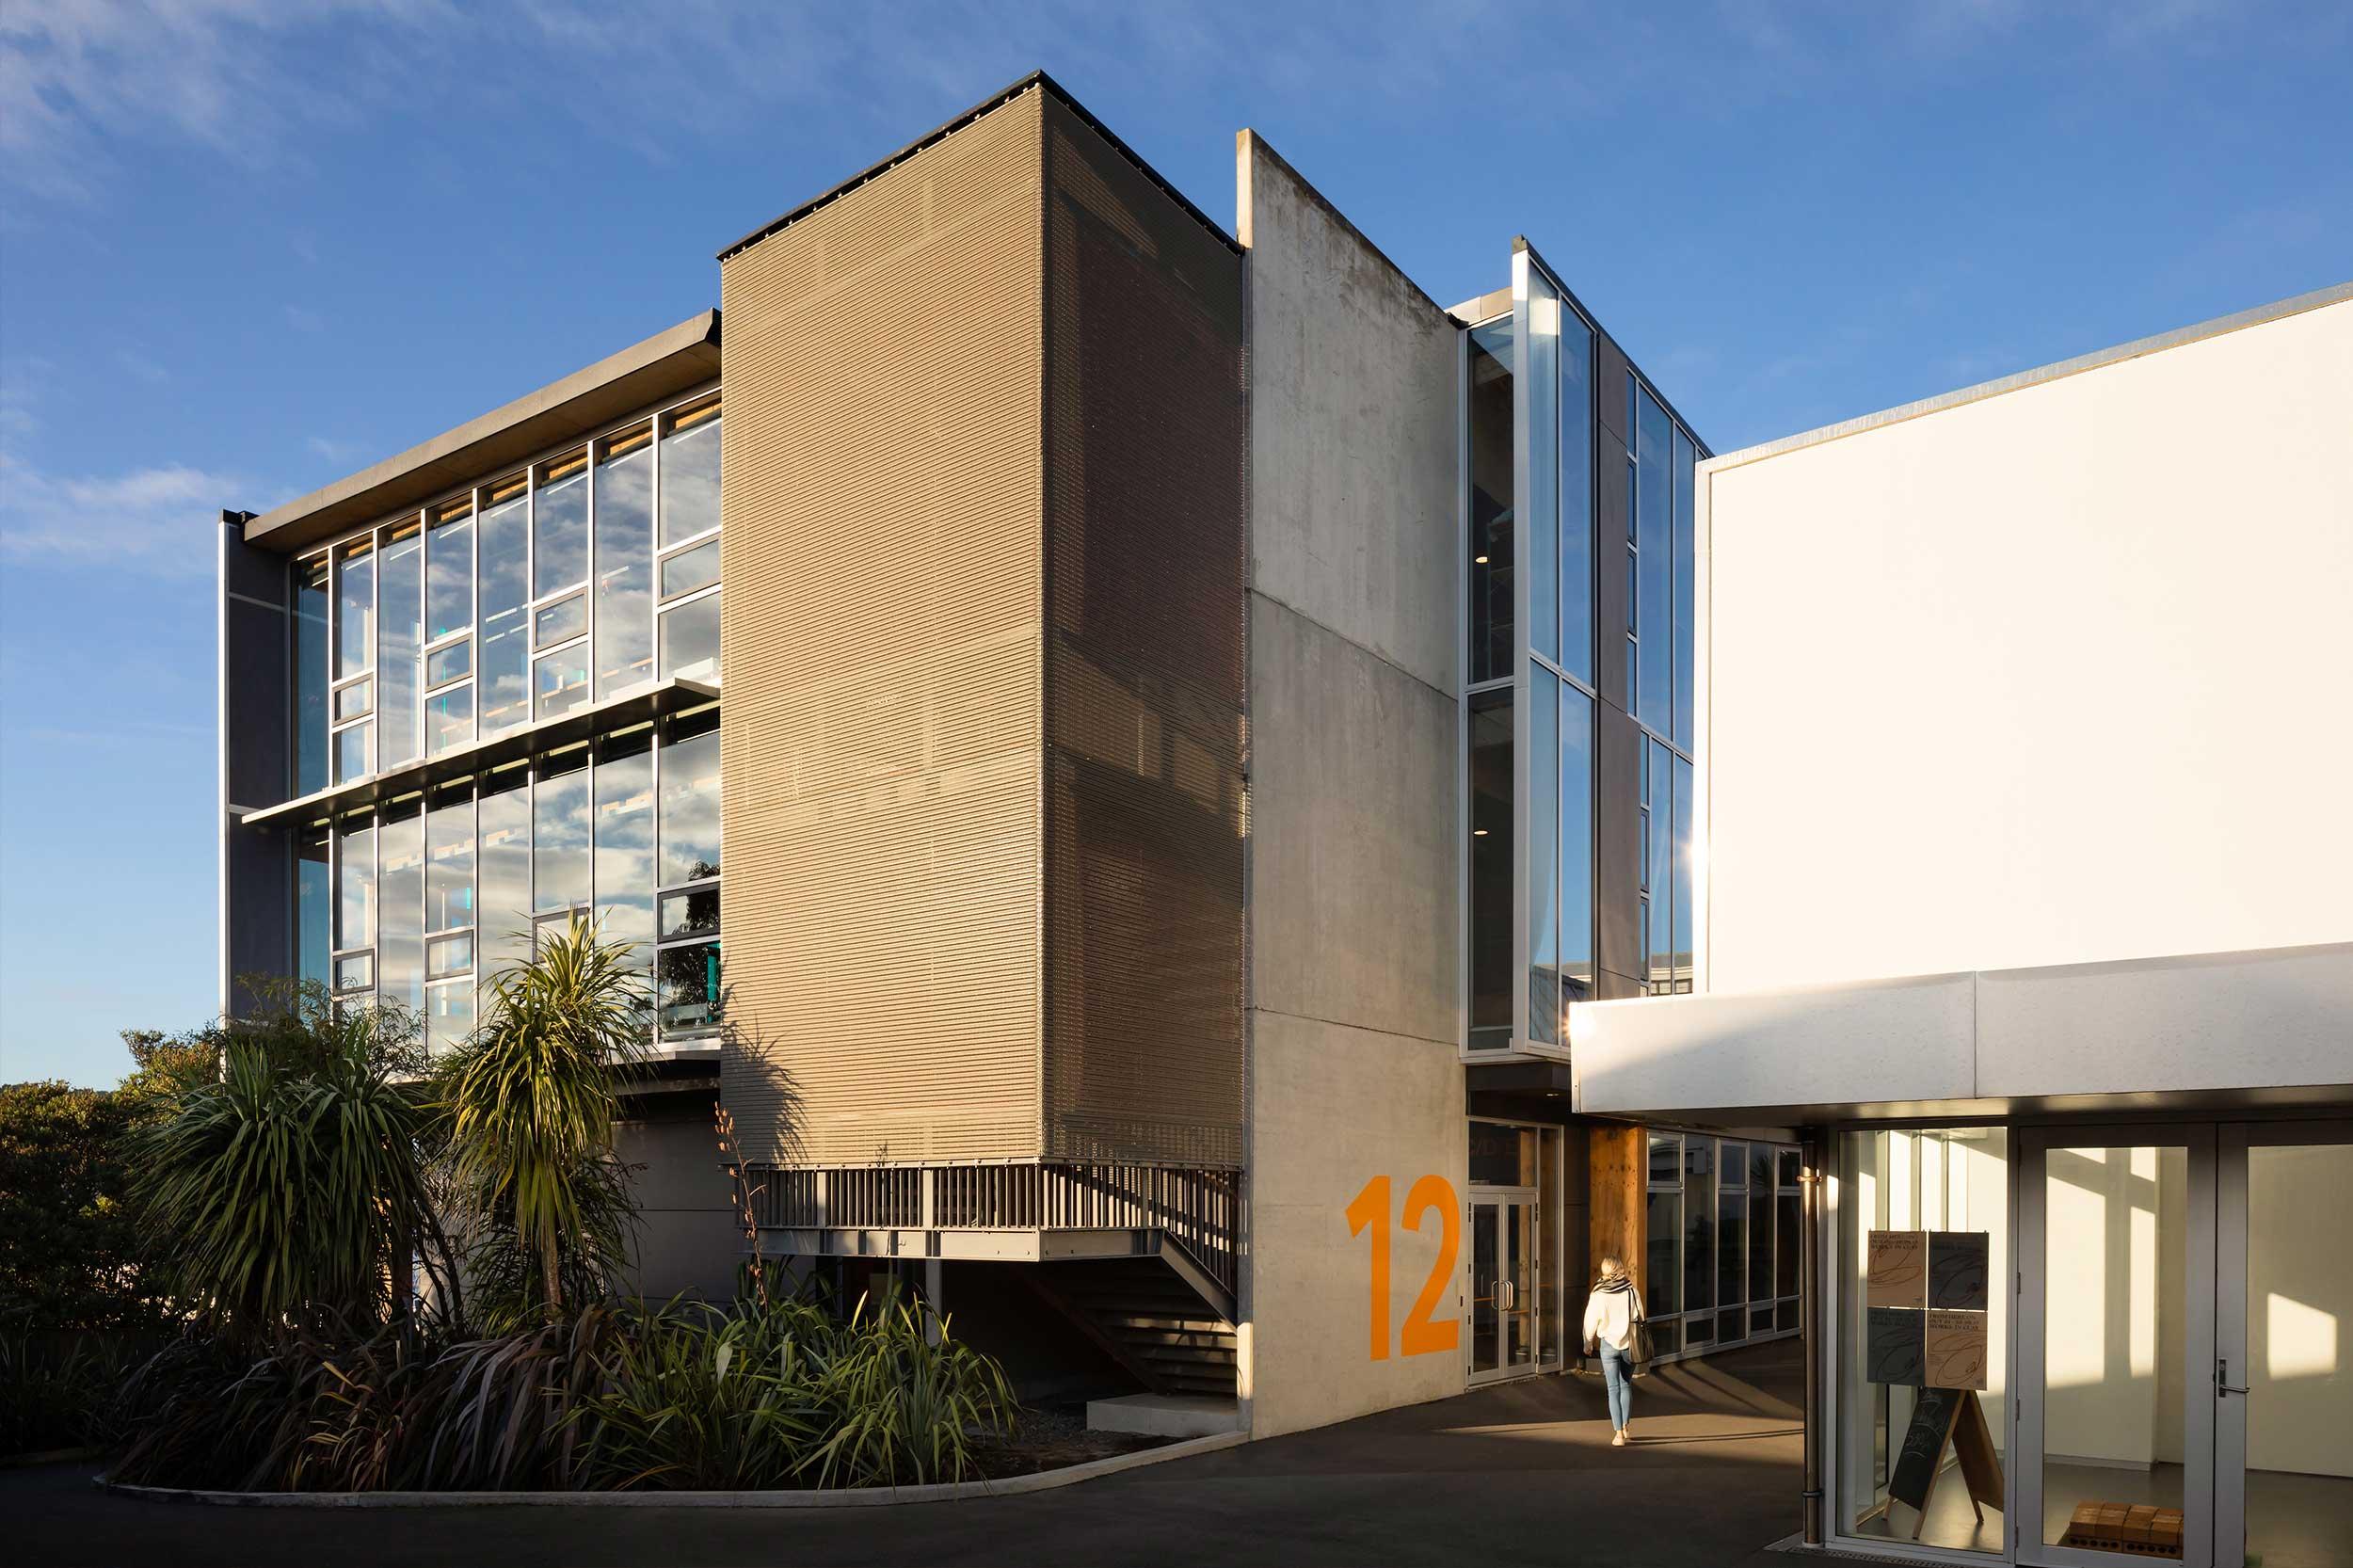 College of Creative Arts, Te Ara Hihiko at Massey University  Wellington, New Zealand    View Project →